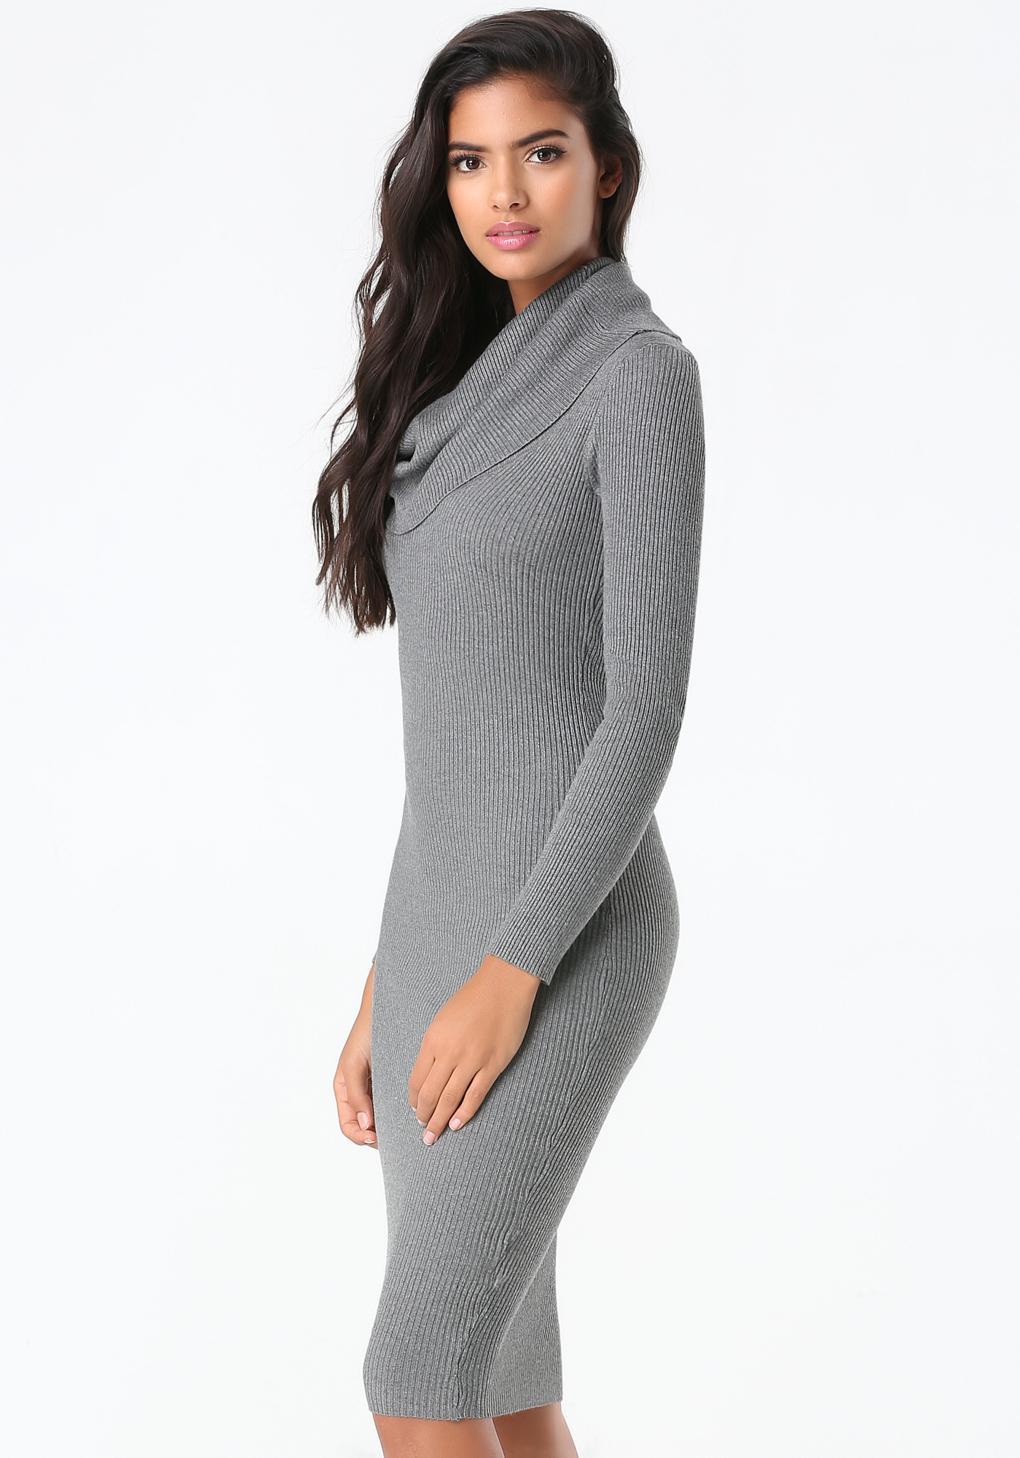 49f7dad00e2 Bebe Cowl Neck Sweater Dress in Gray - Lyst